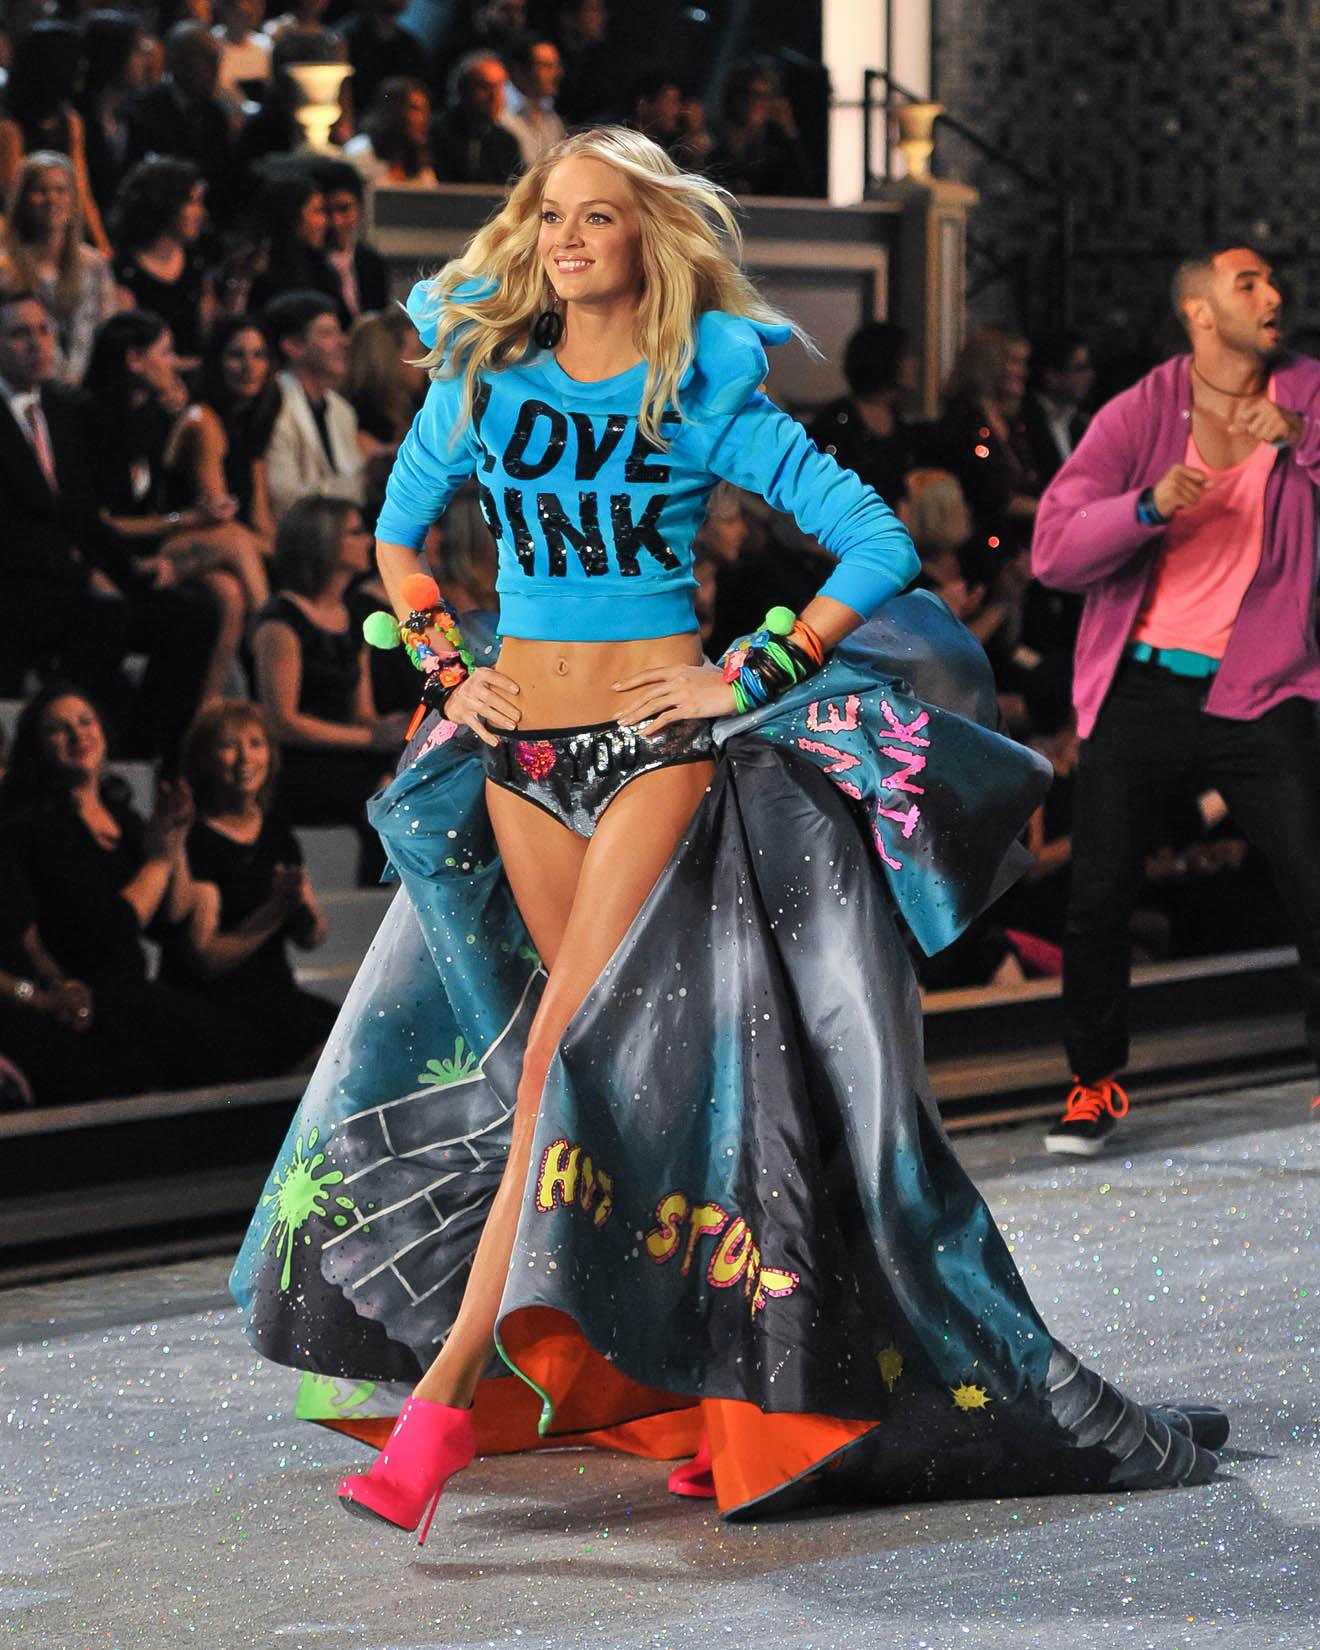 Victoria's Secret 2011 Fashion Show Pics